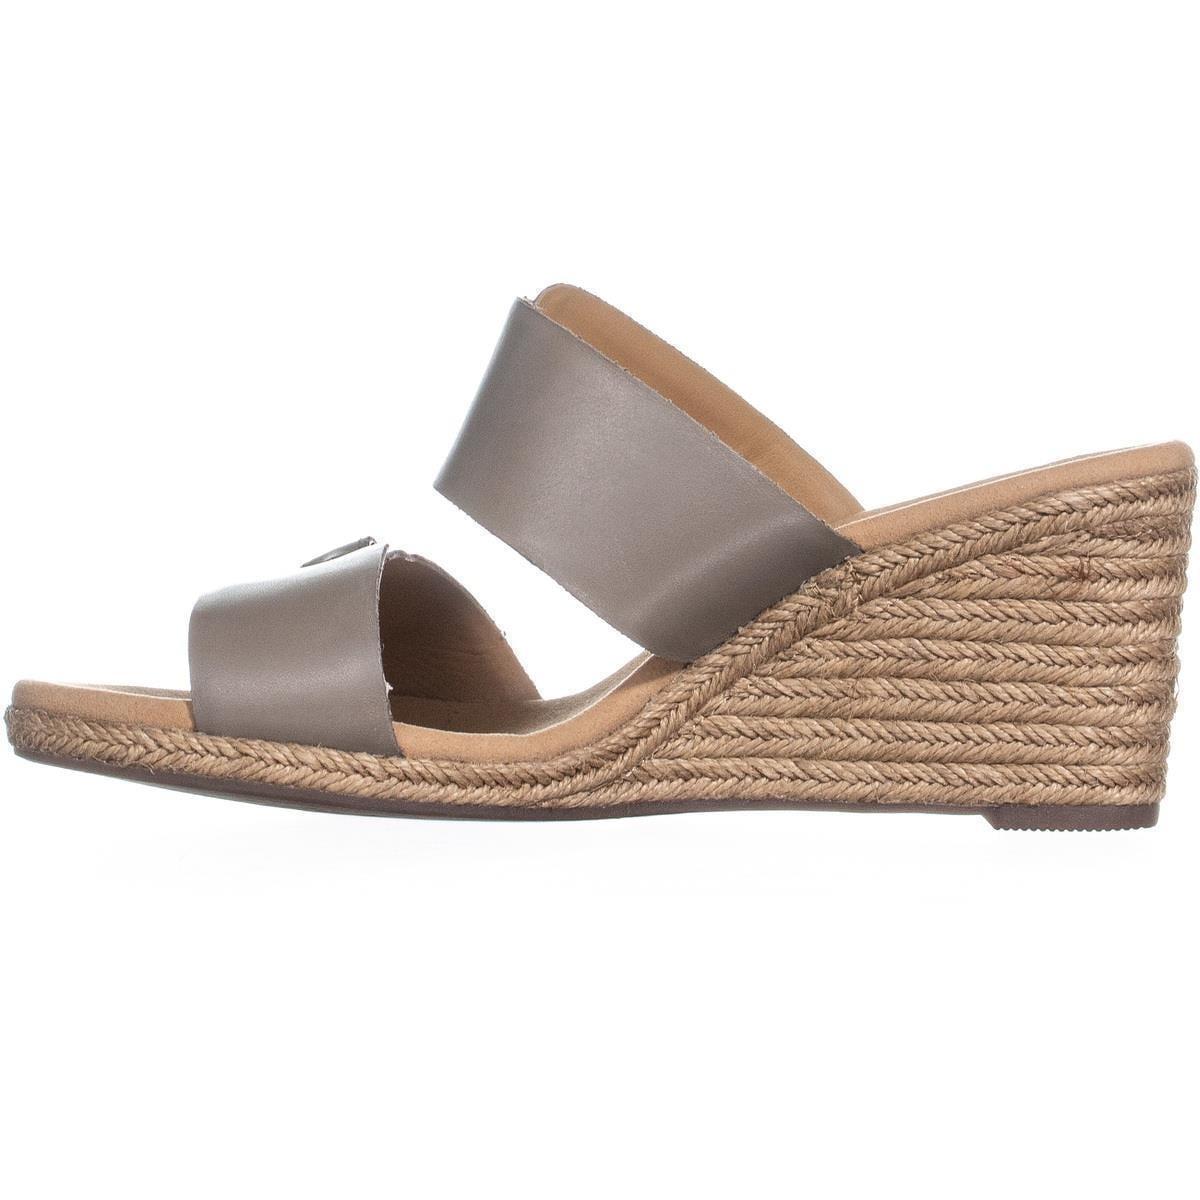 17c28138bae Clarks Lafley Devin Wedge Espadrilles Sandals, Sage